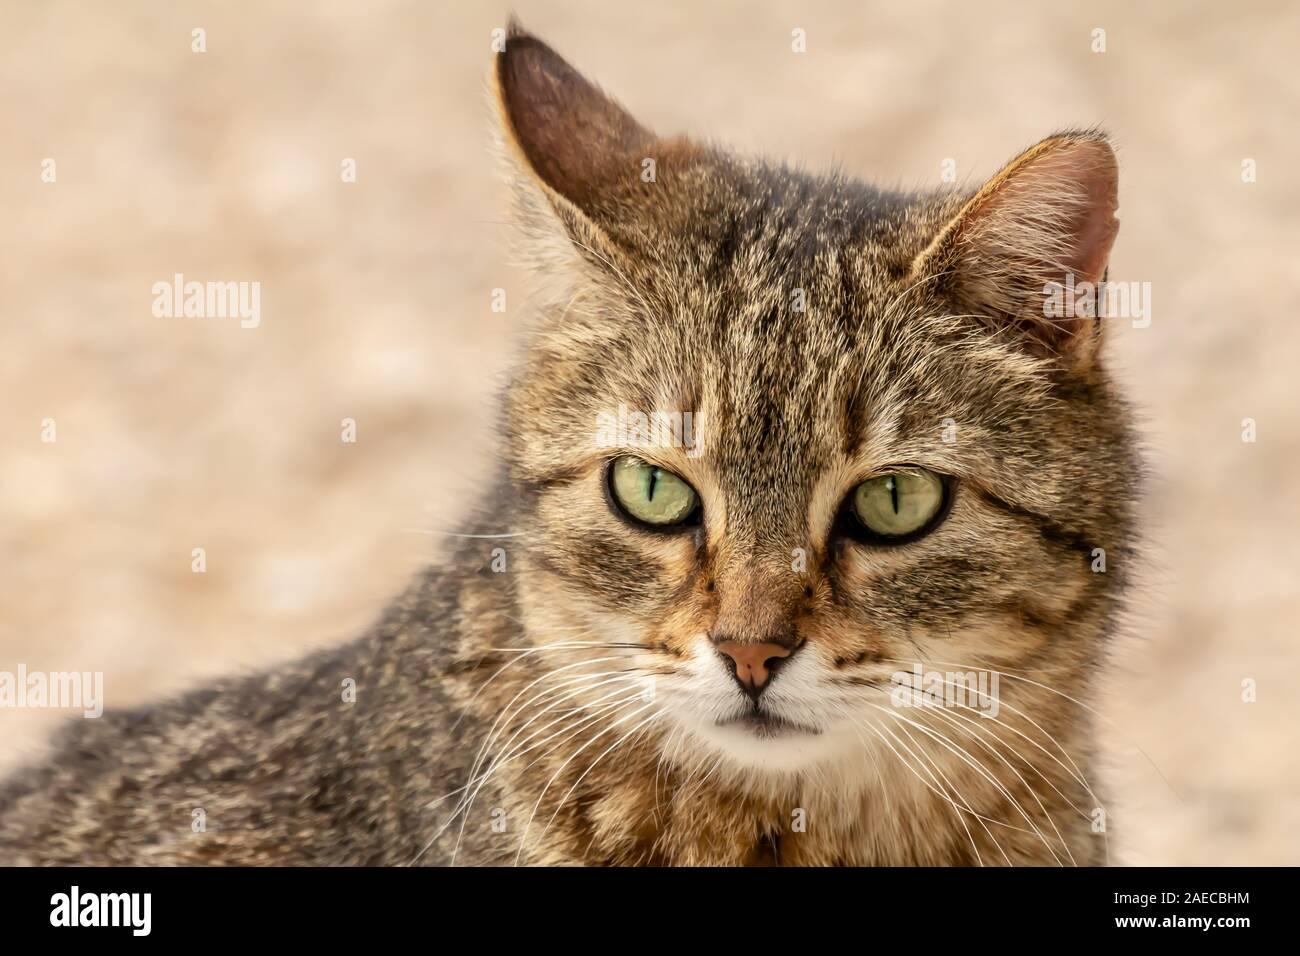 Close-up street cat portrait of European Shorthair breed Stock Photo